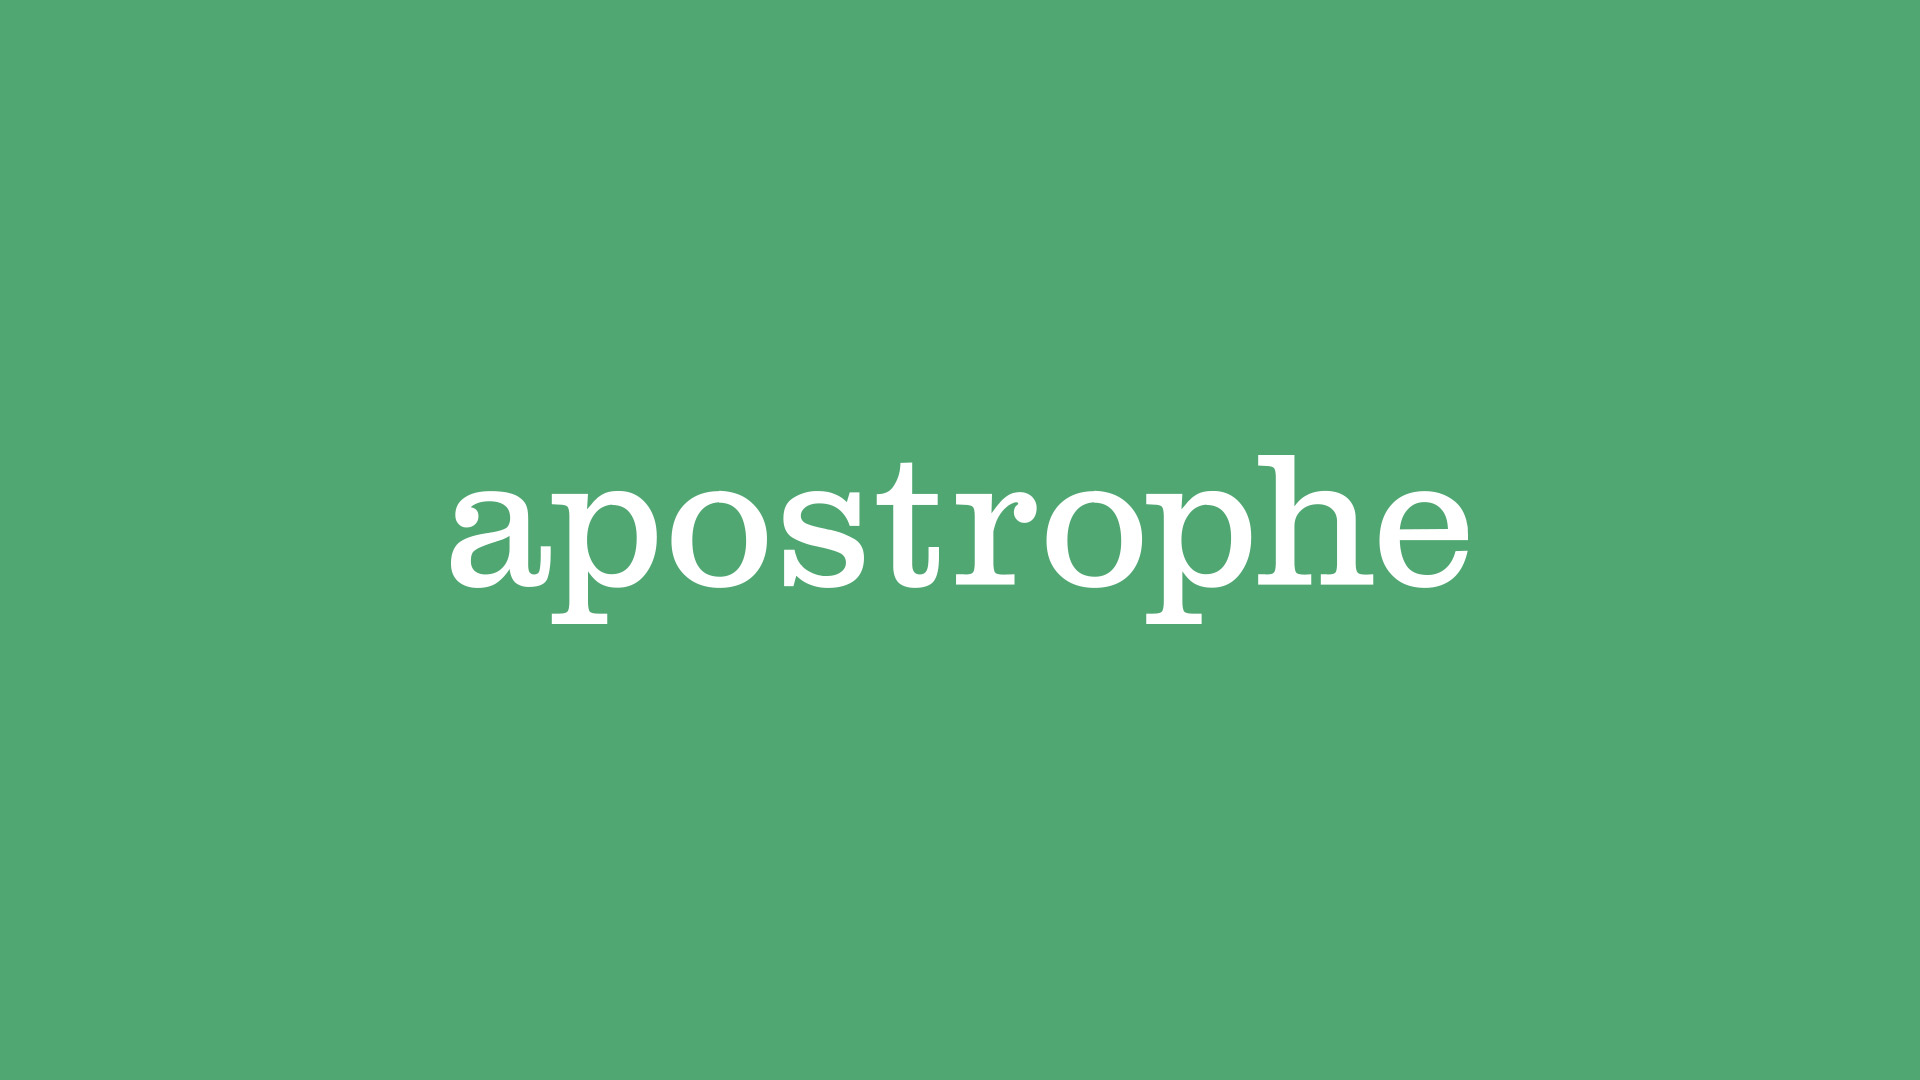 apostrophe wordmark design